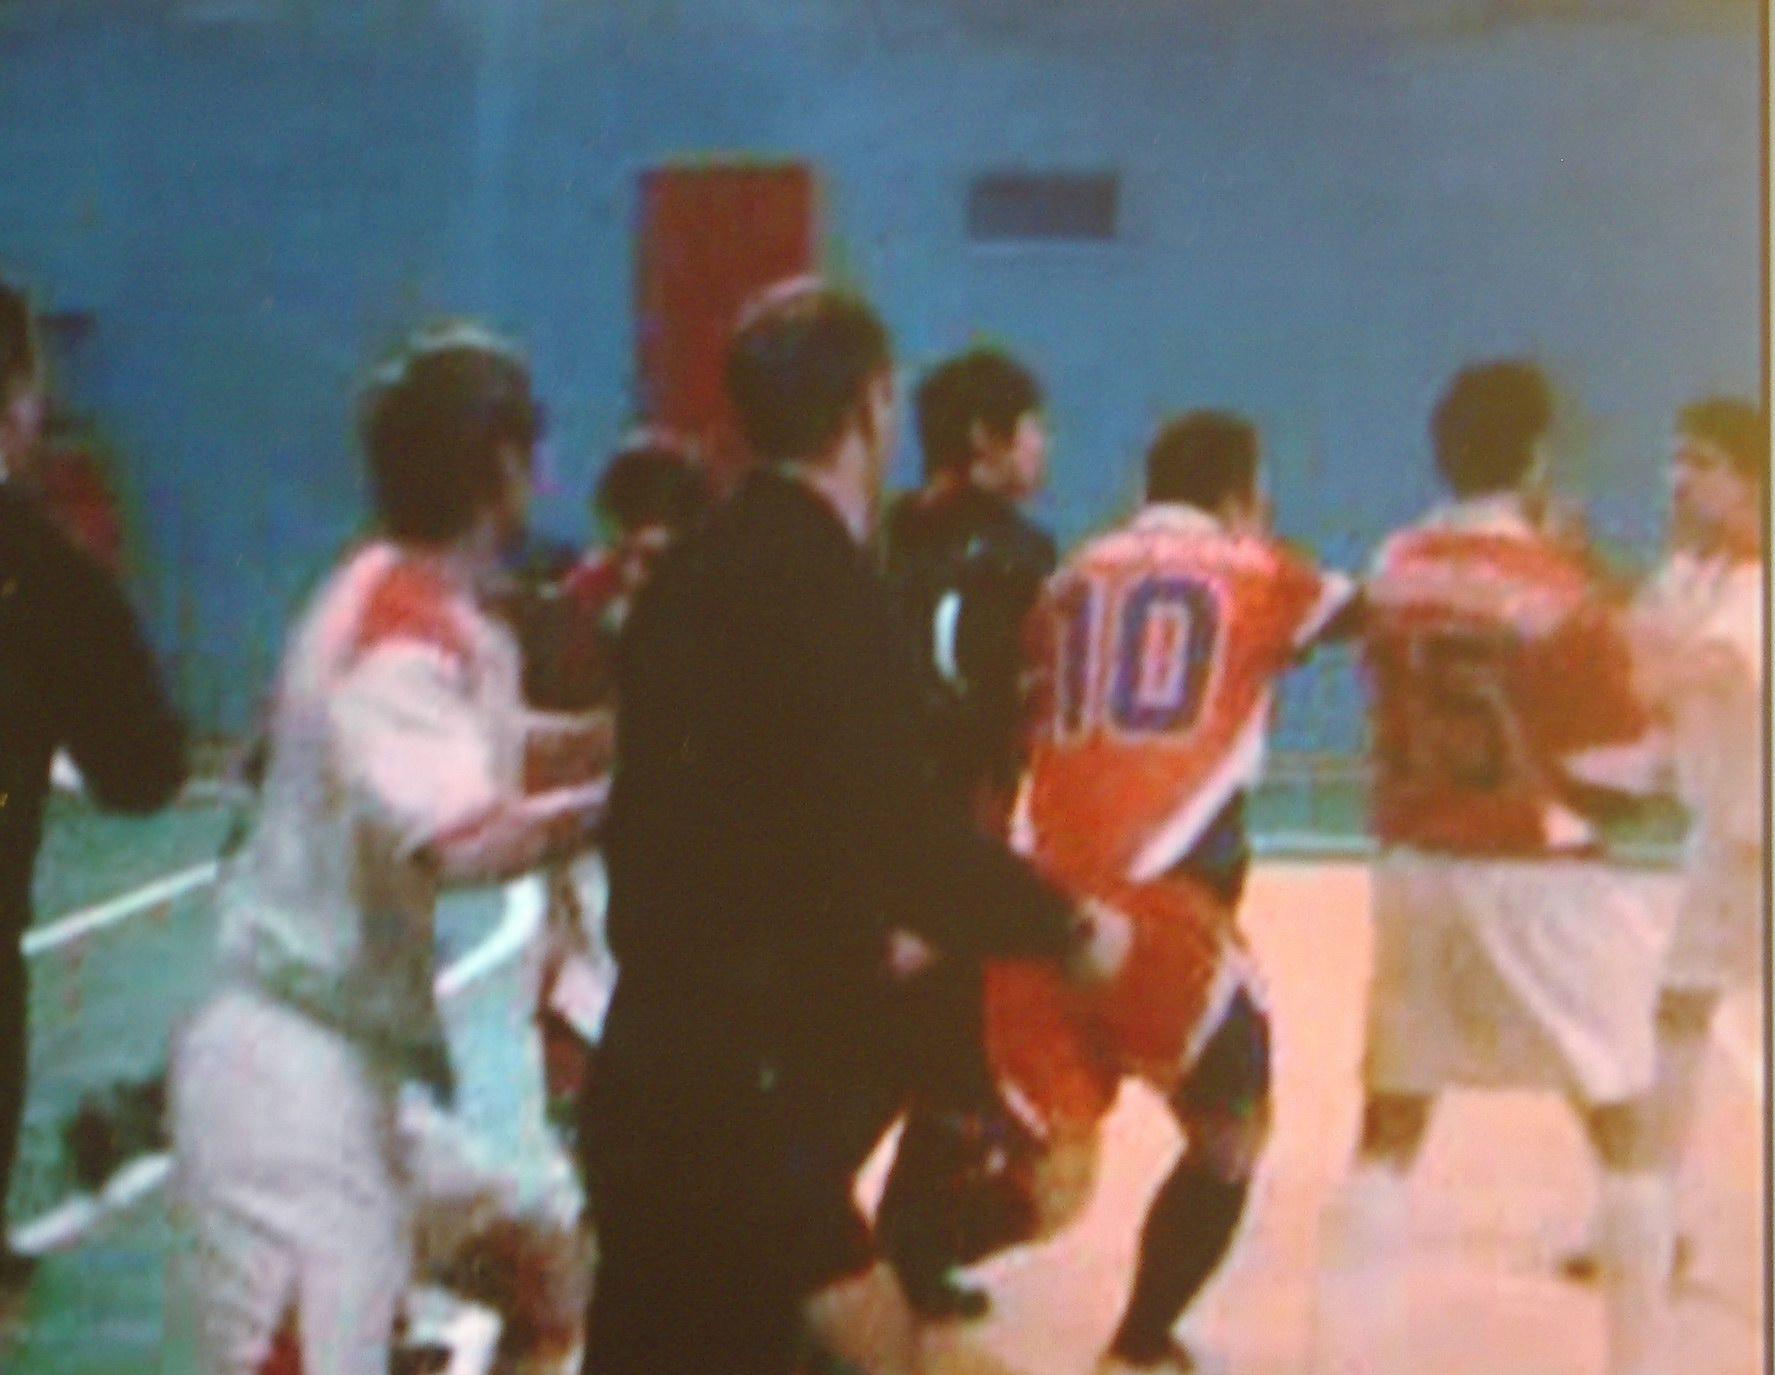 драка между футболистами ФК «Малинники» и «Молодой гвардии»